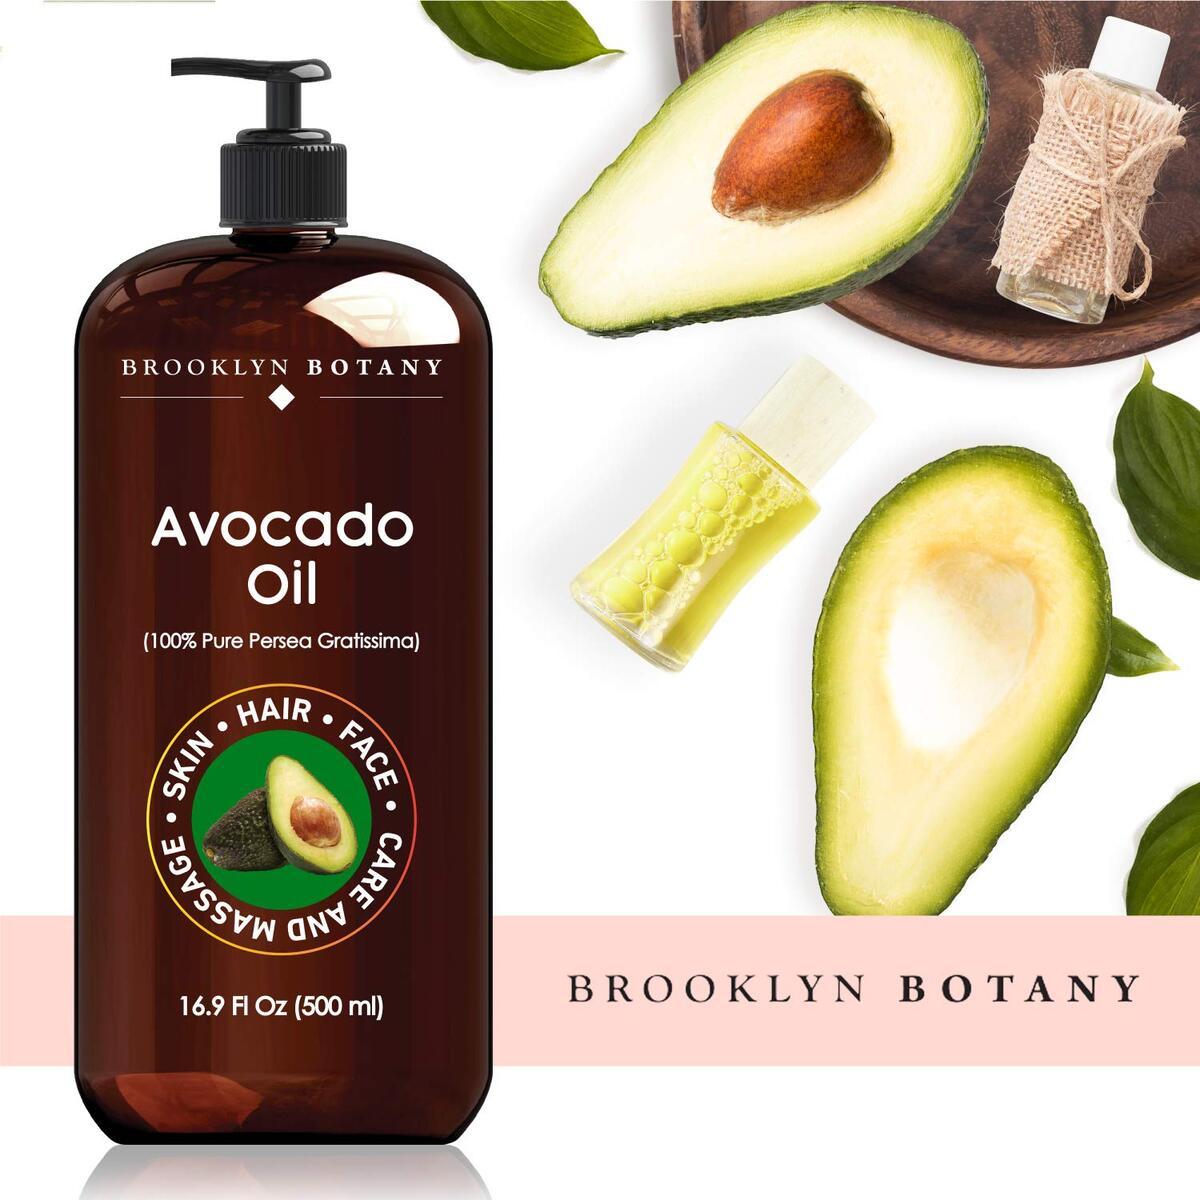 Brooklyn Botany Avocado Oil For Skin and Hair